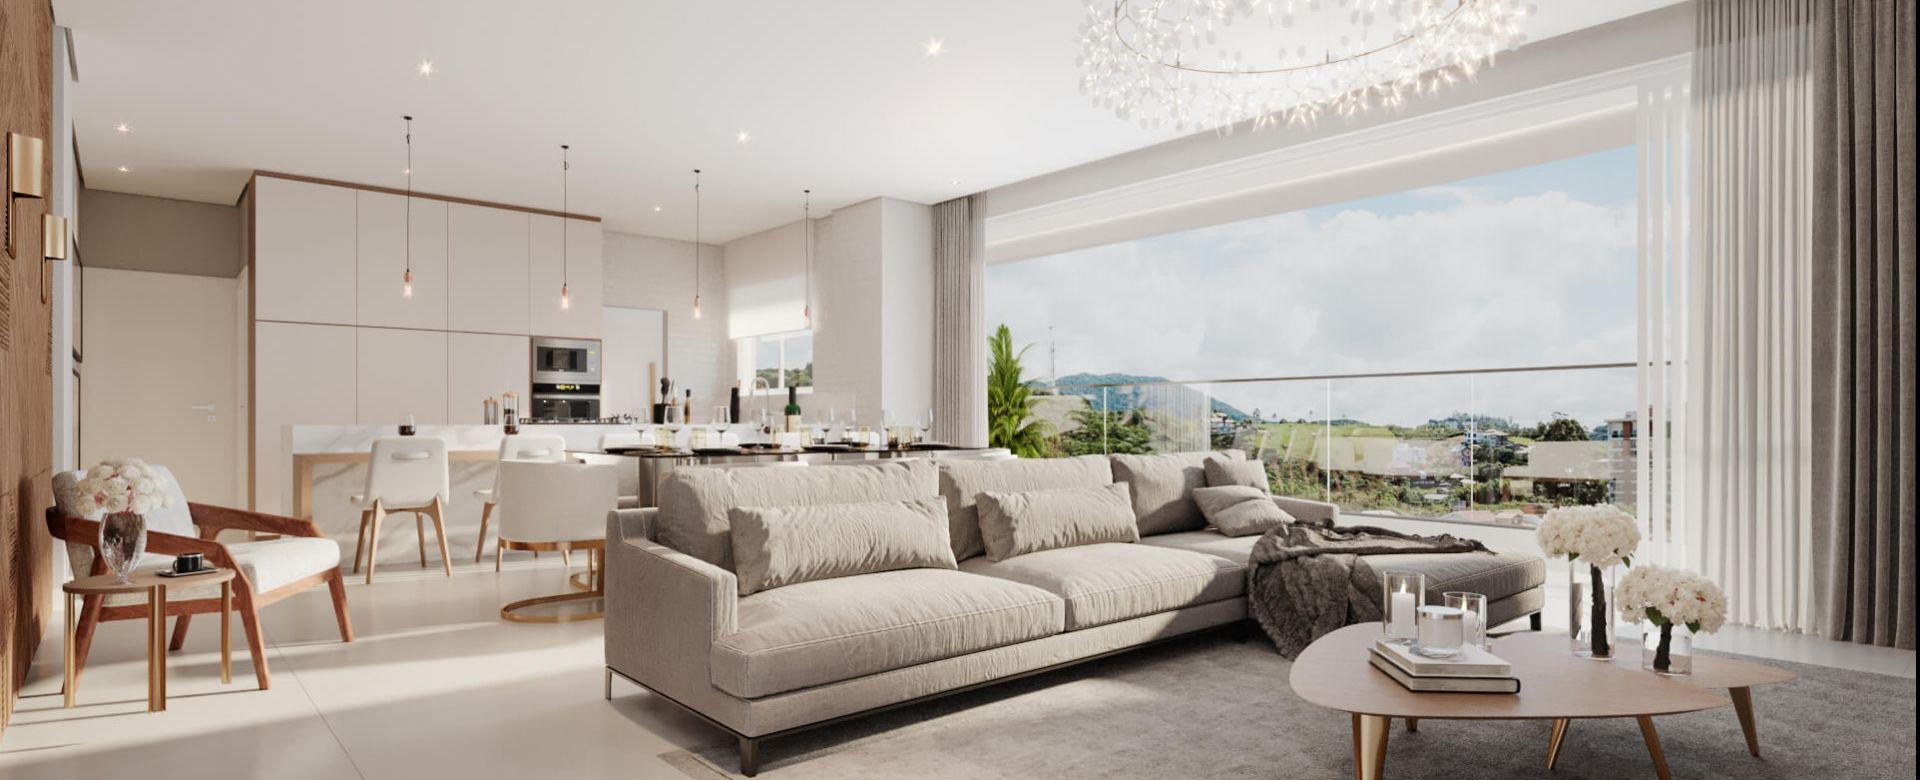 Le Blanc Brava Residence, foto 1